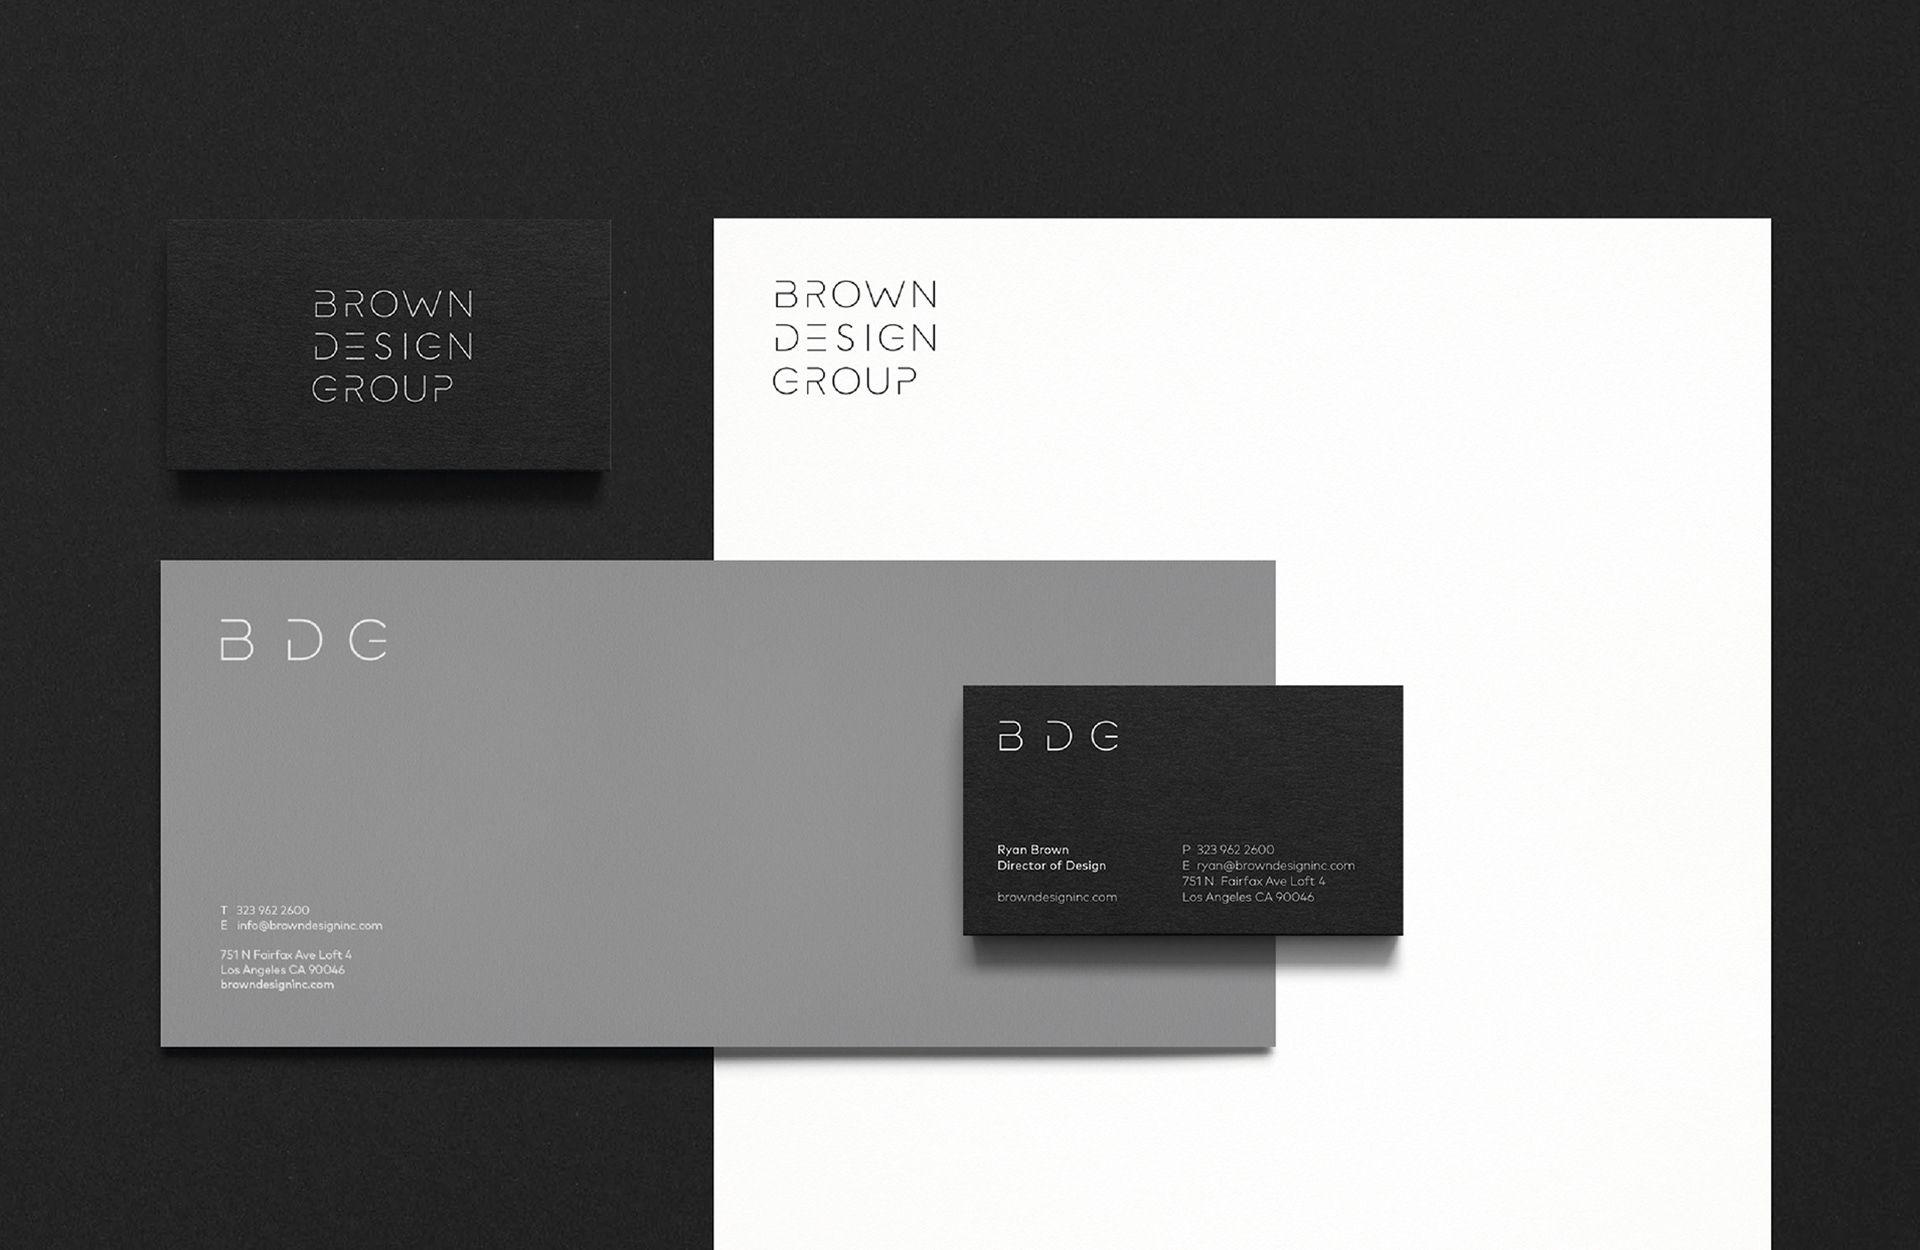 Brown Design Group On Behance Interior Design And Build Design Build Firm Web Development Design